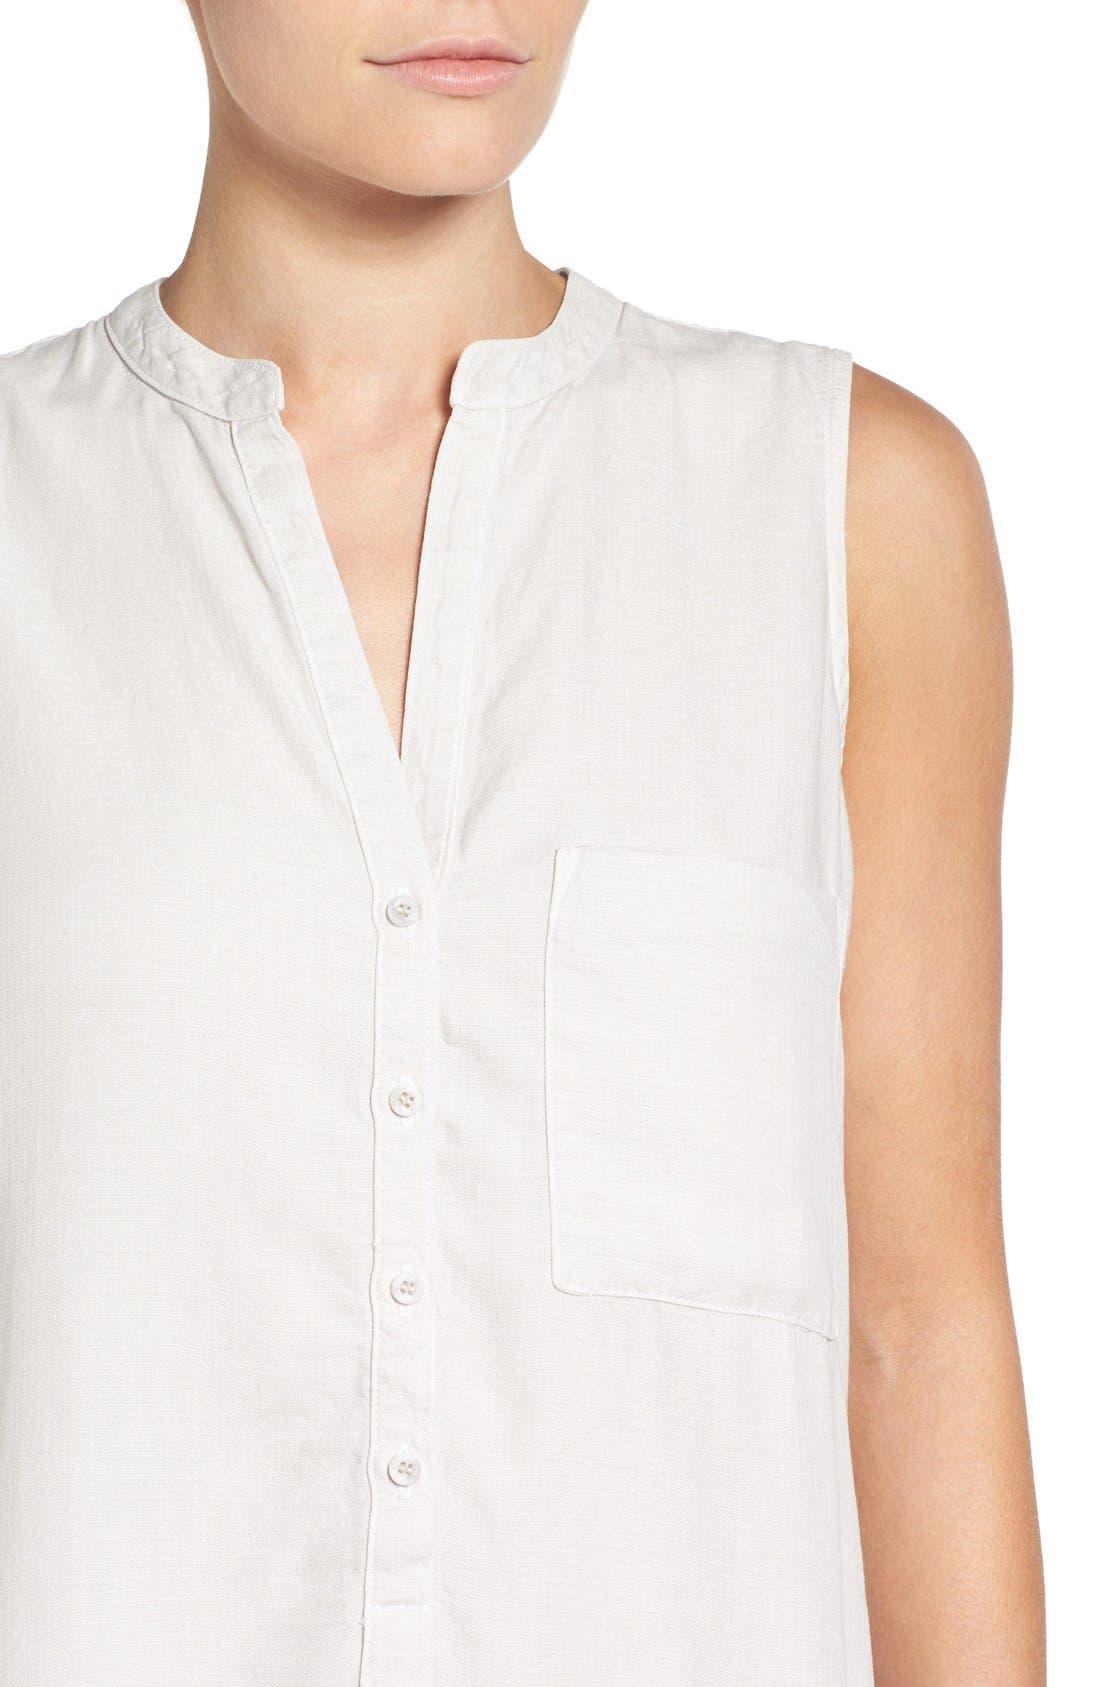 SIDE STITCH, Sleeveless Band Collar Shirtdress, Alternate thumbnail 2, color, 020